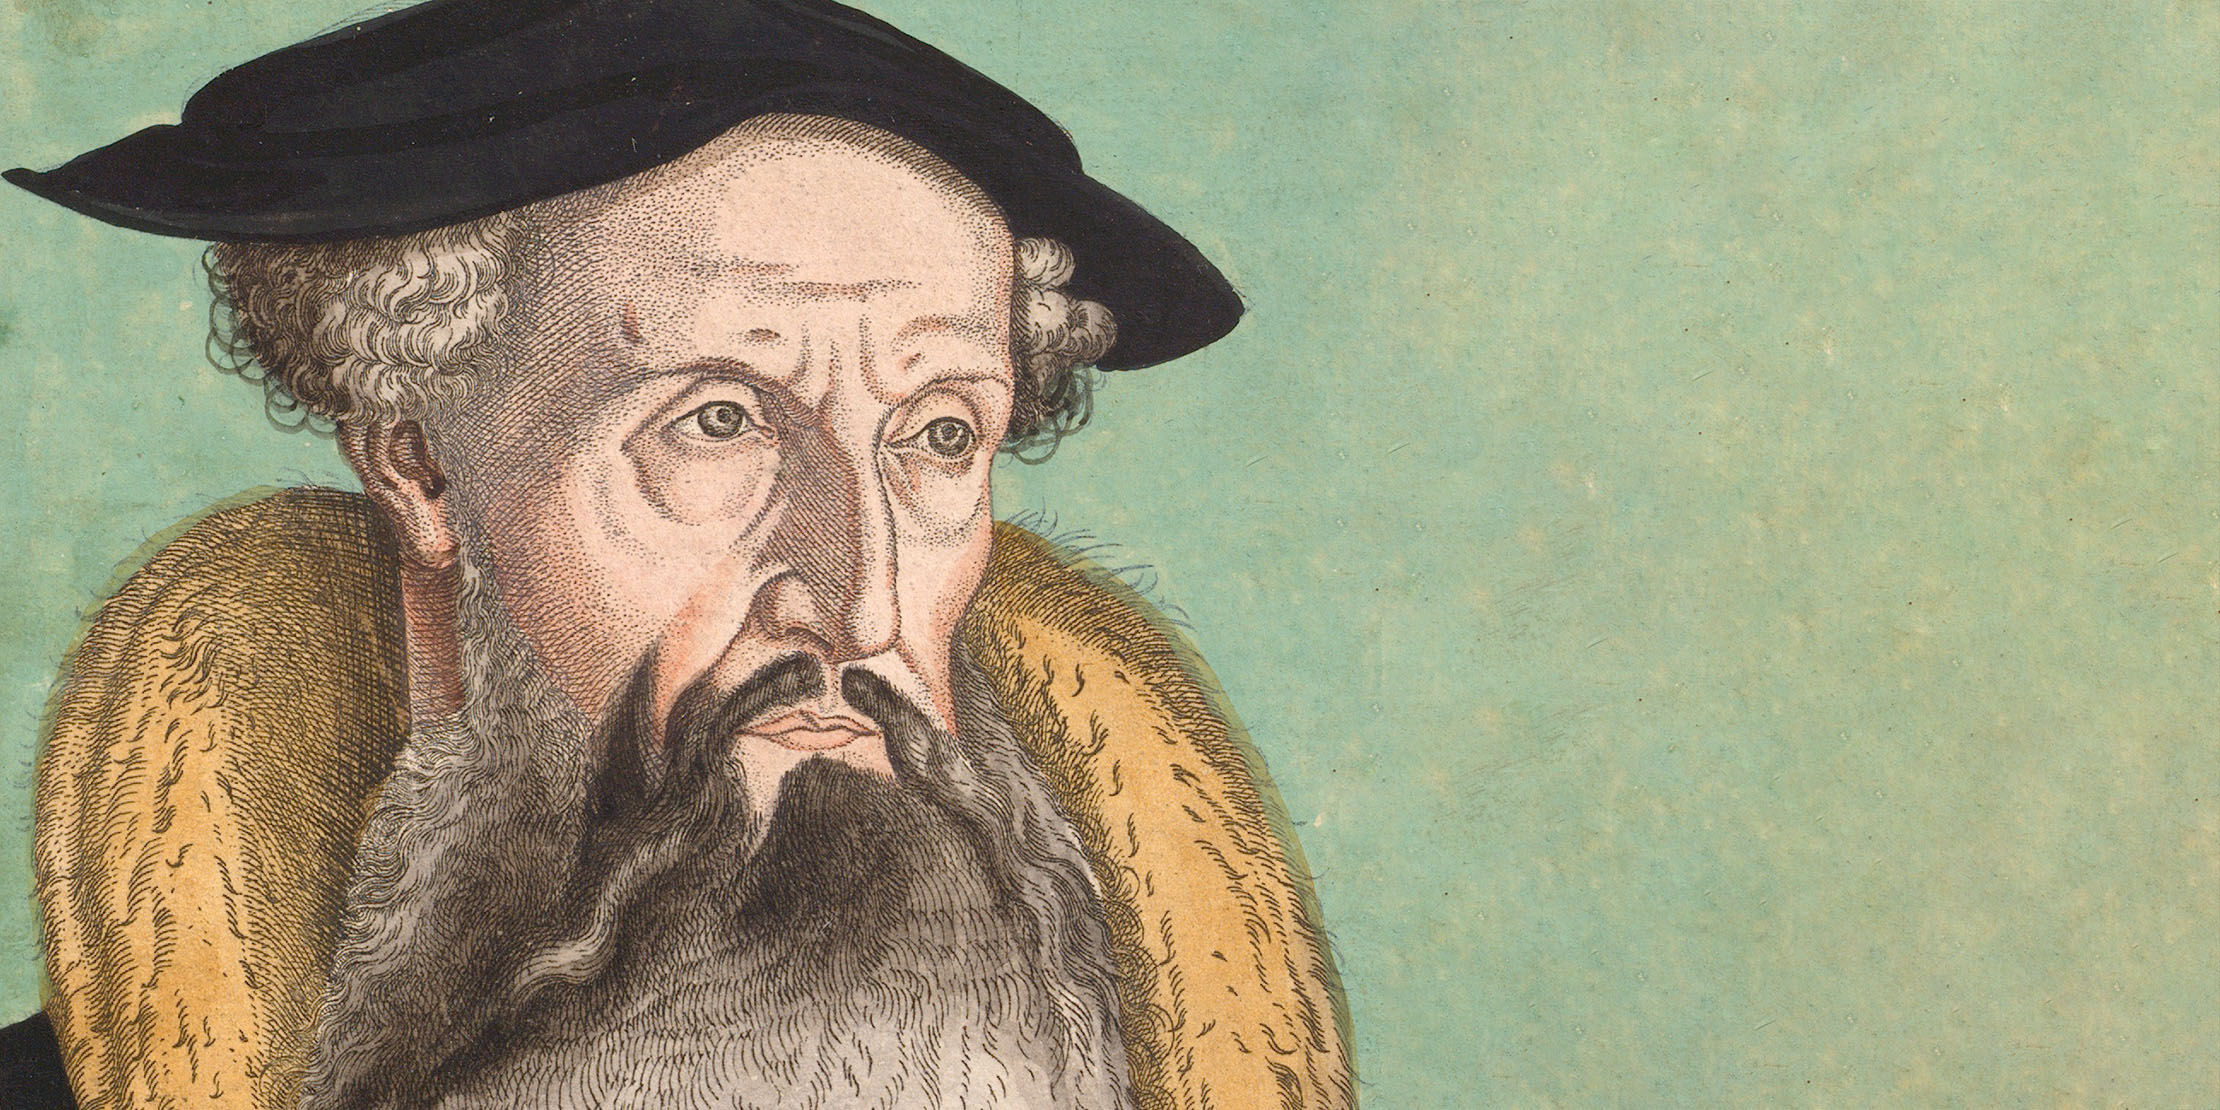 ABGESAGT: Heinrich Bullinger als Geschichtsschreiber